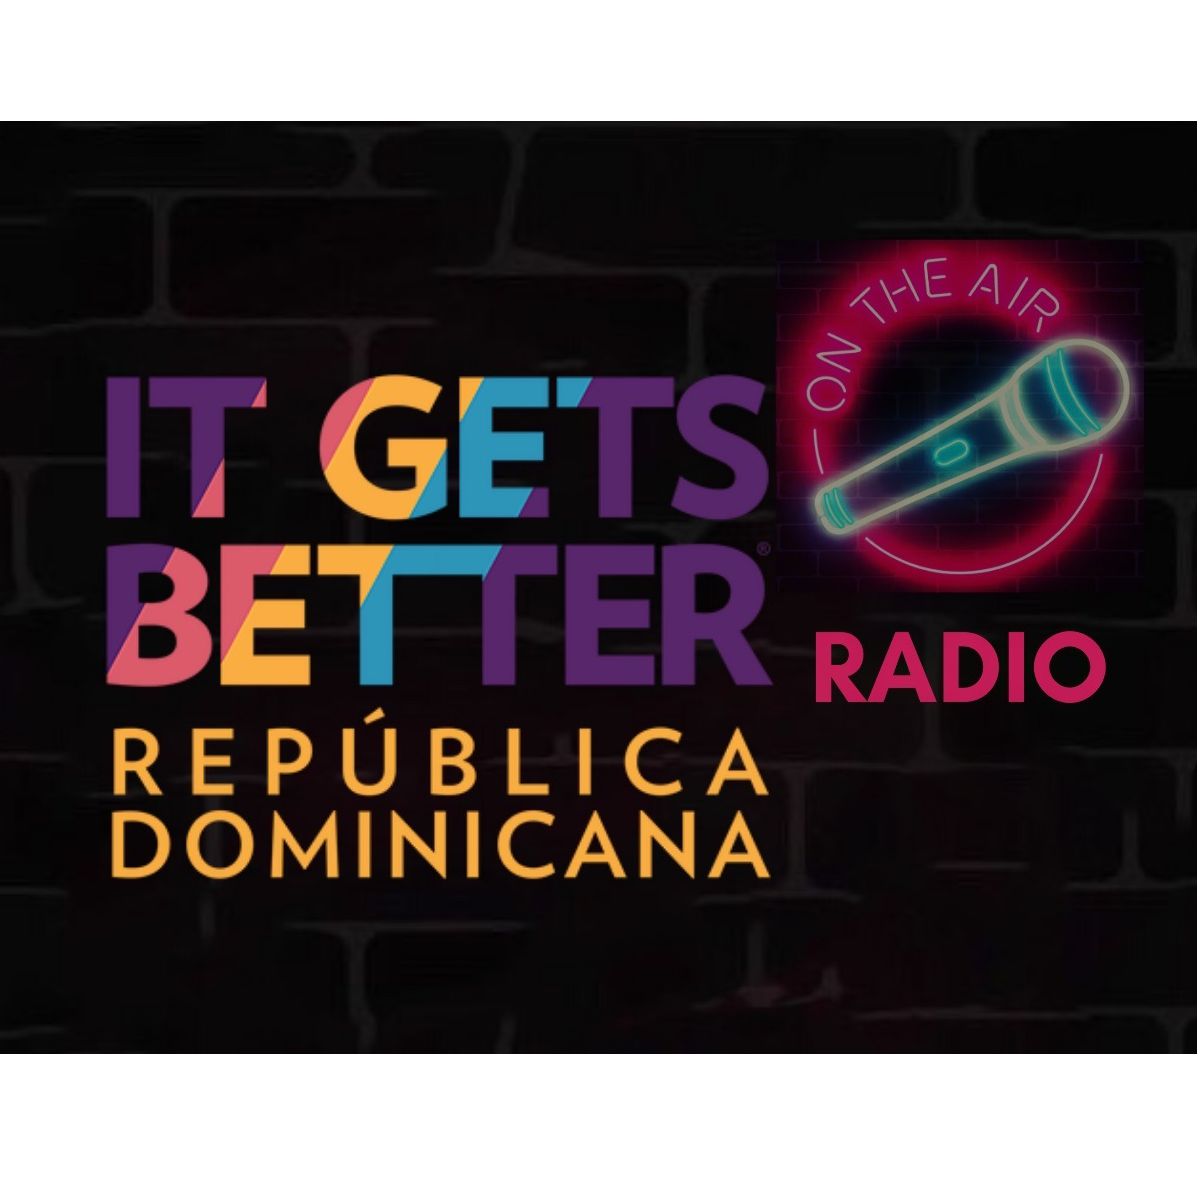 It Gets Better Dominicana Radio